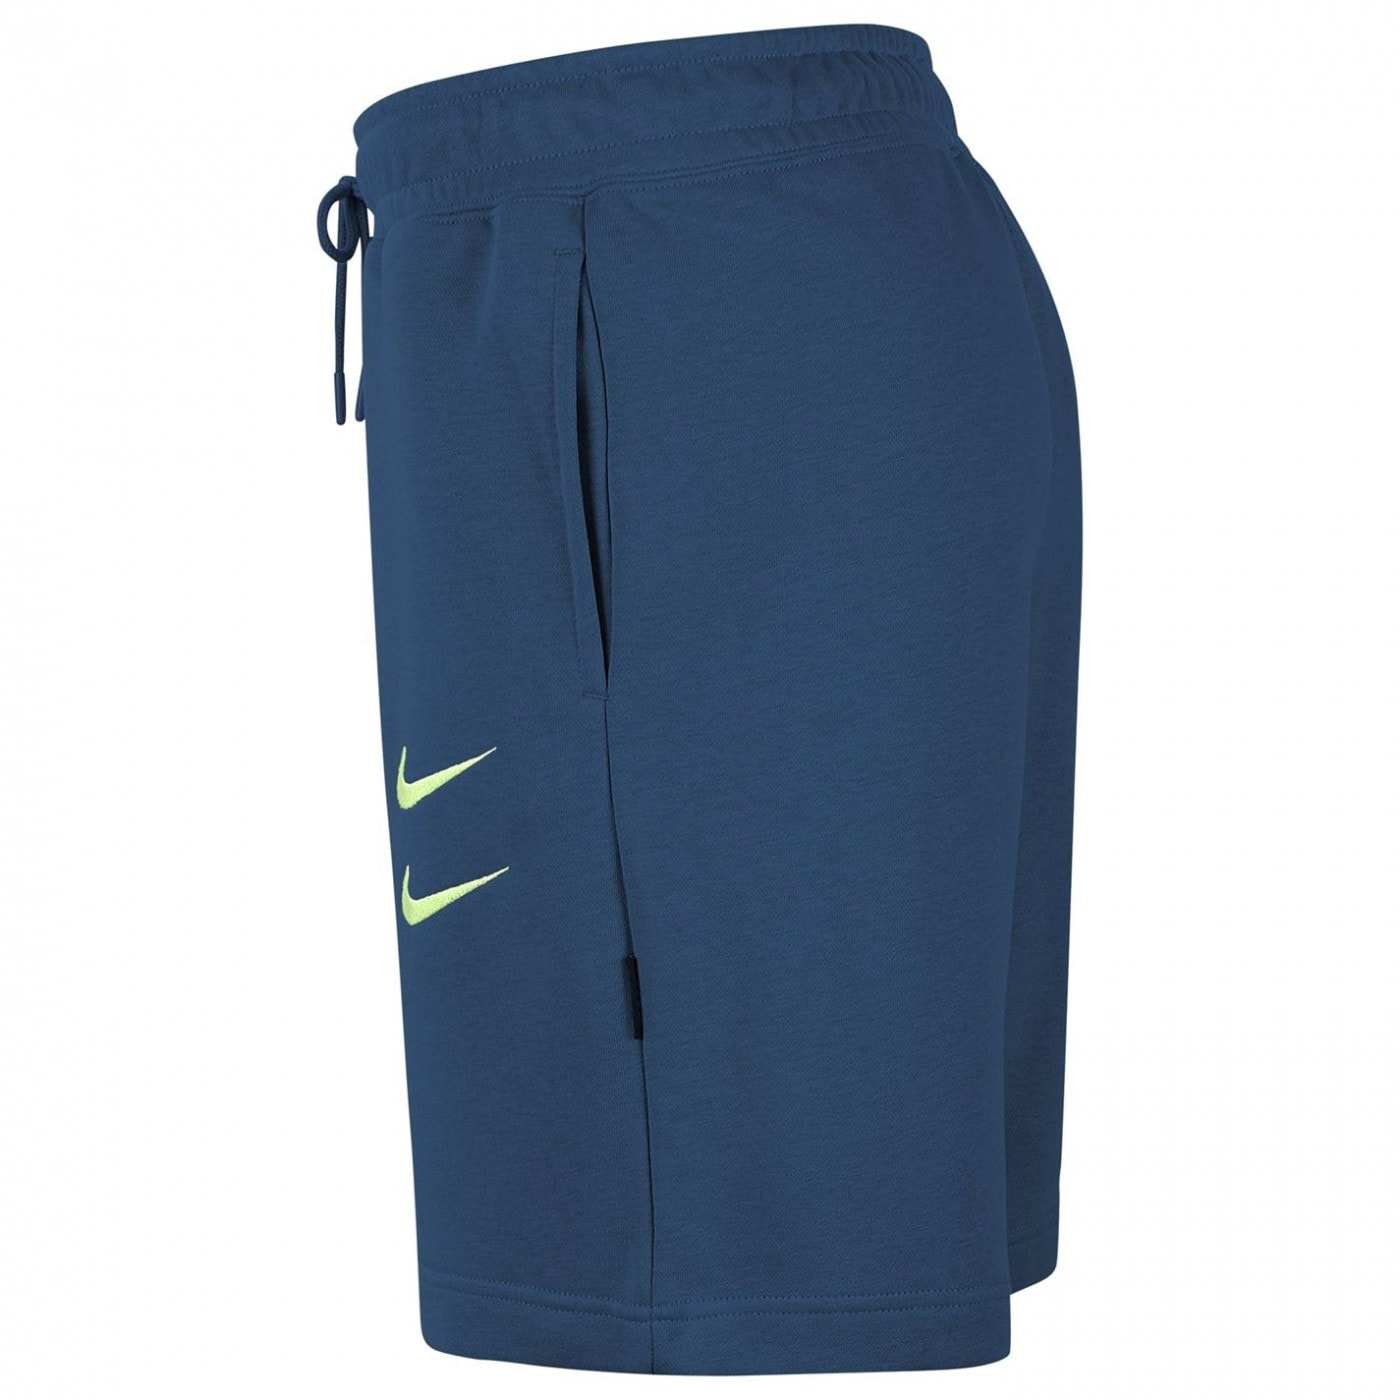 Nike Swoosh Shorts Mens